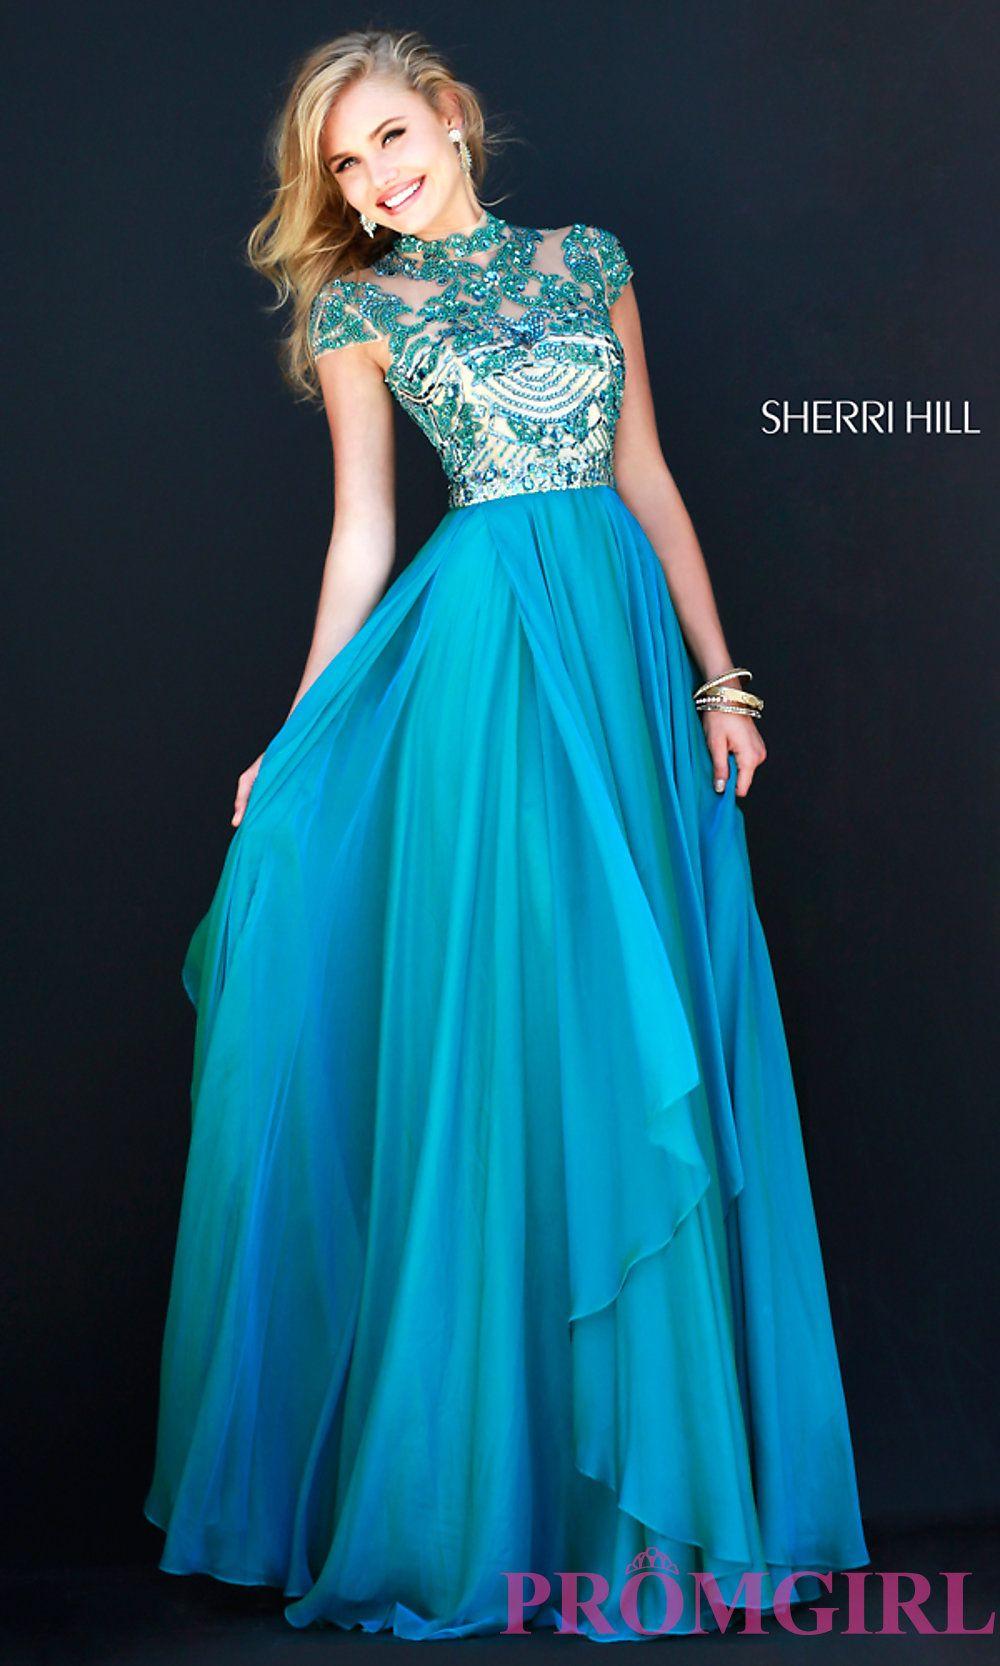 Prom dresses shop merry hill - Dress on sale